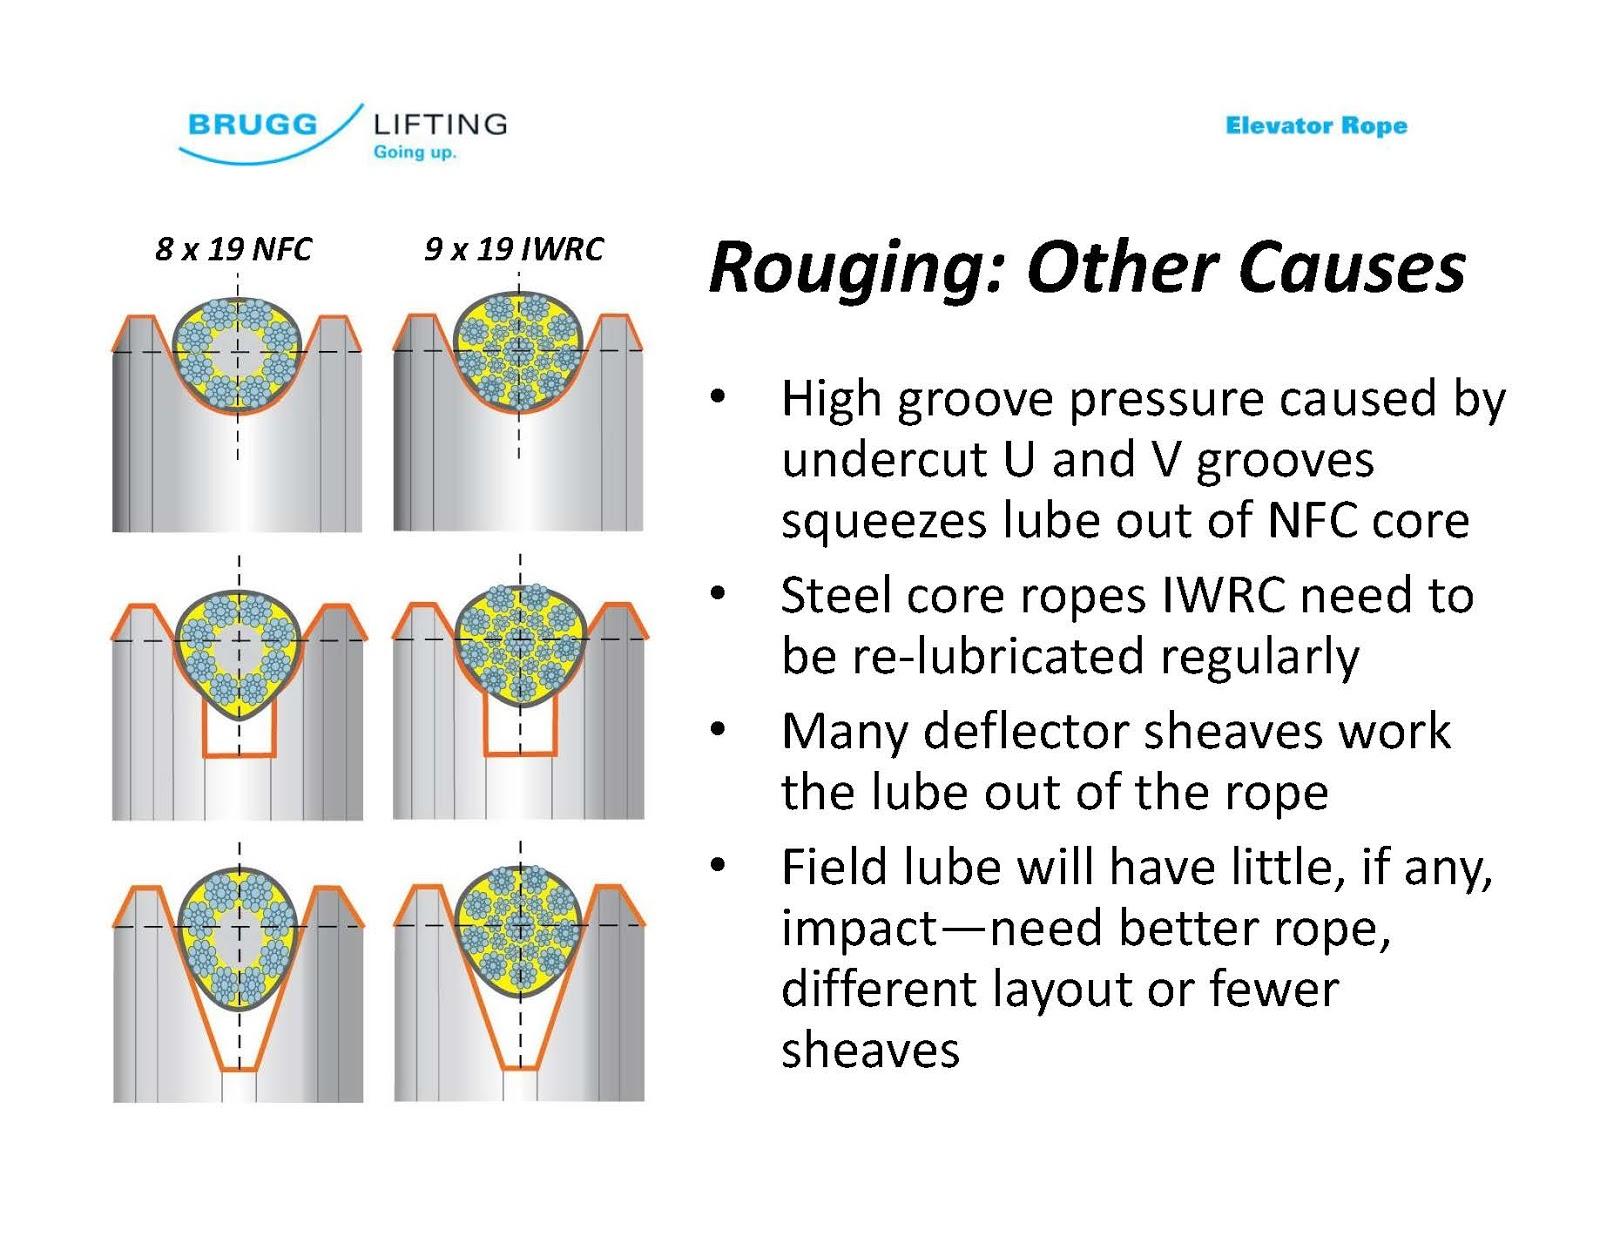 hhs wiring diagram snatch block diagrams wiring diagram